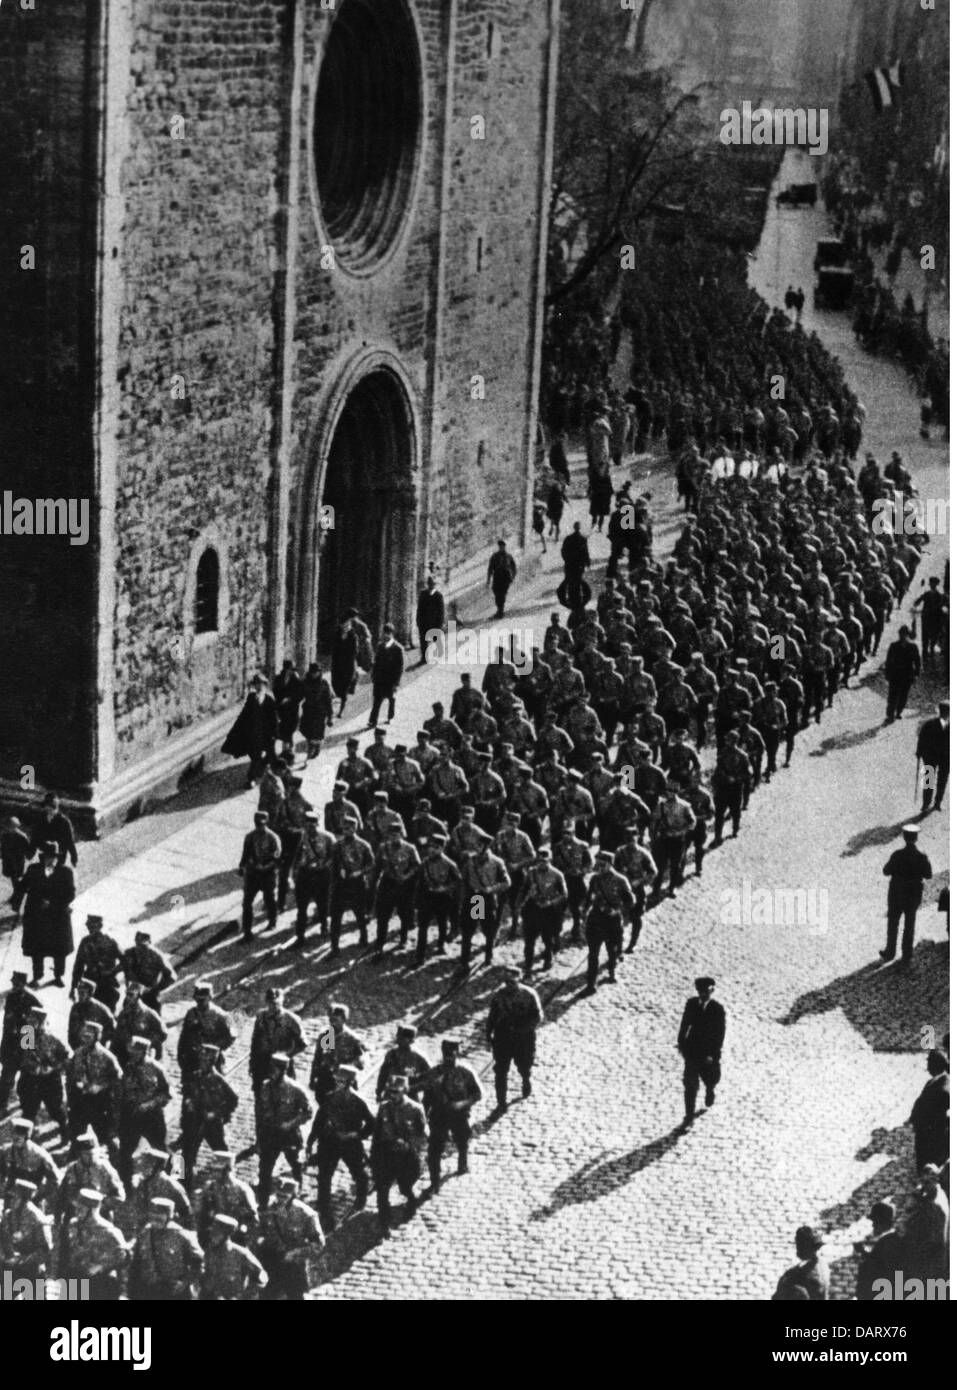 Nazism / National Socialism, organisations, storm troopers, (Sturmabteilung, SA), meeting in Brunswick, SA units - Stock Image